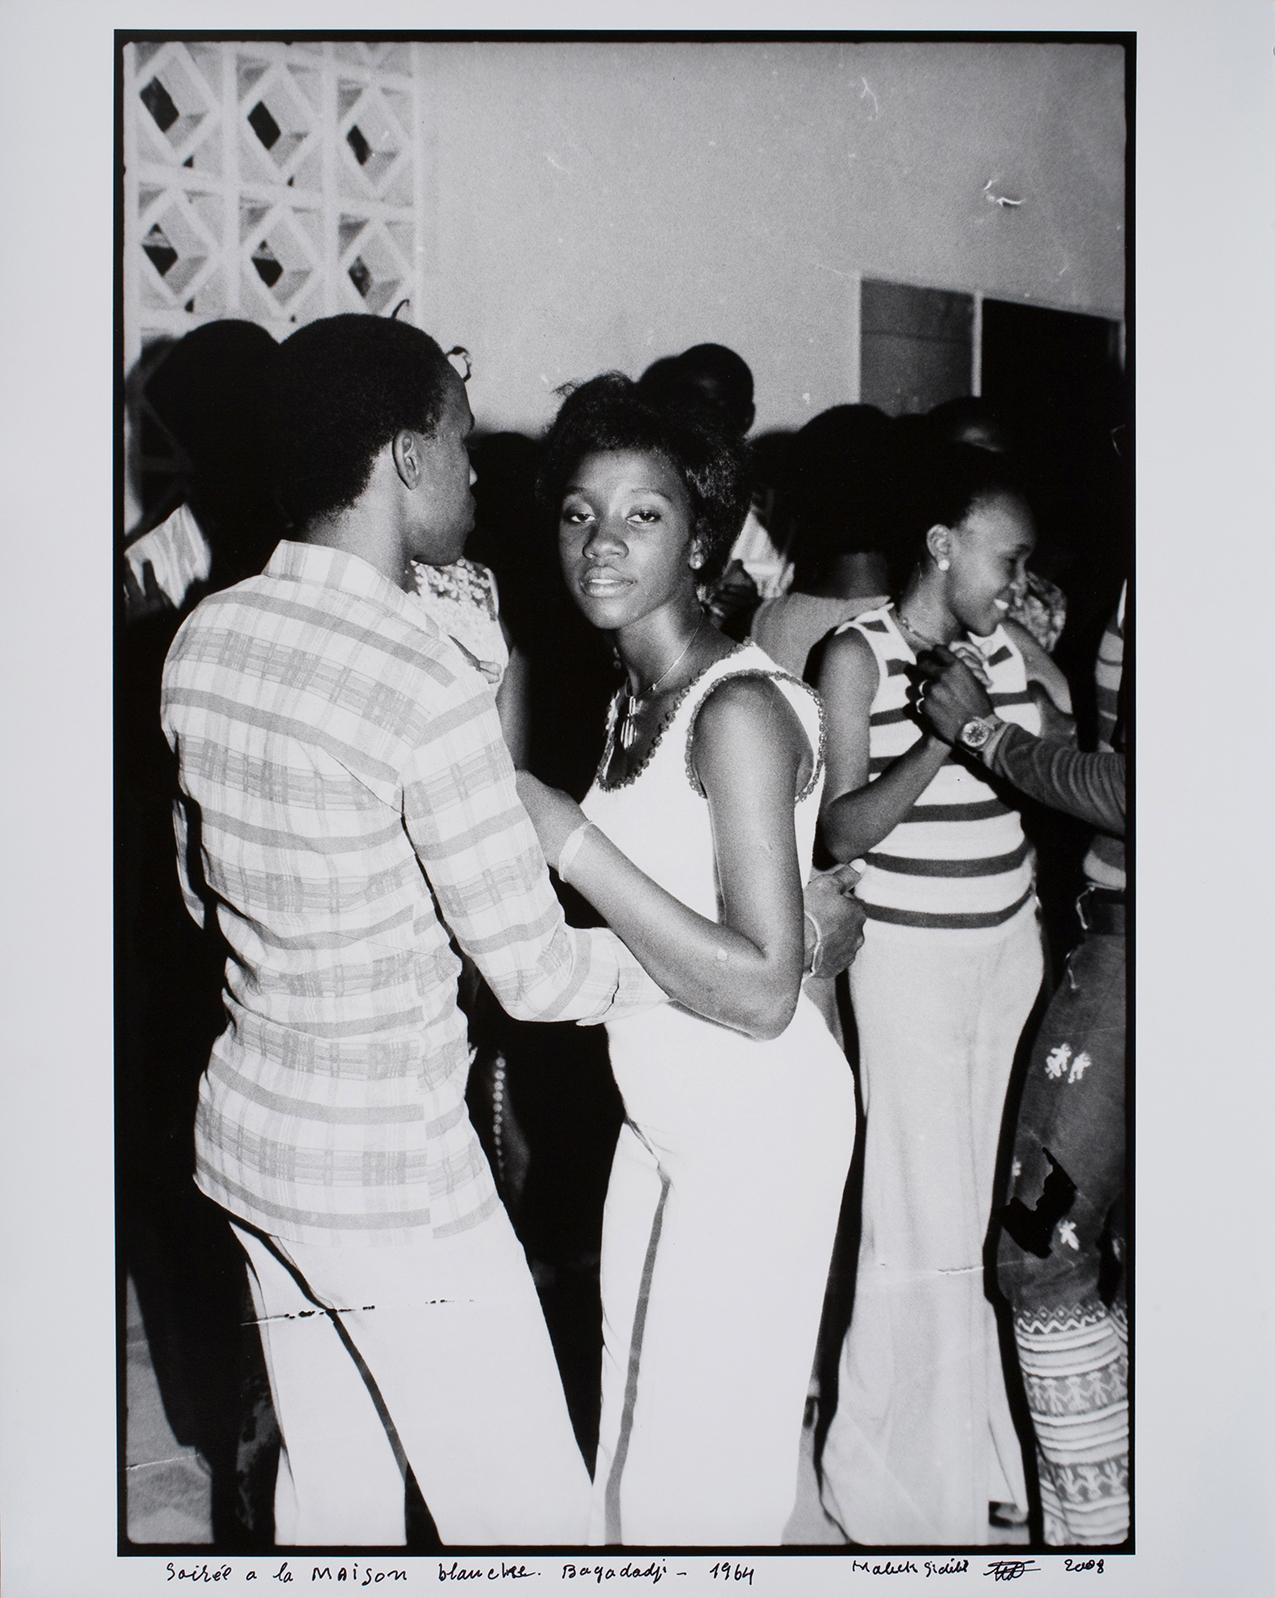 Soirée à la maison blanche. Bagadadji - 1964 . Image courtesy Jack Shainman Gallery.